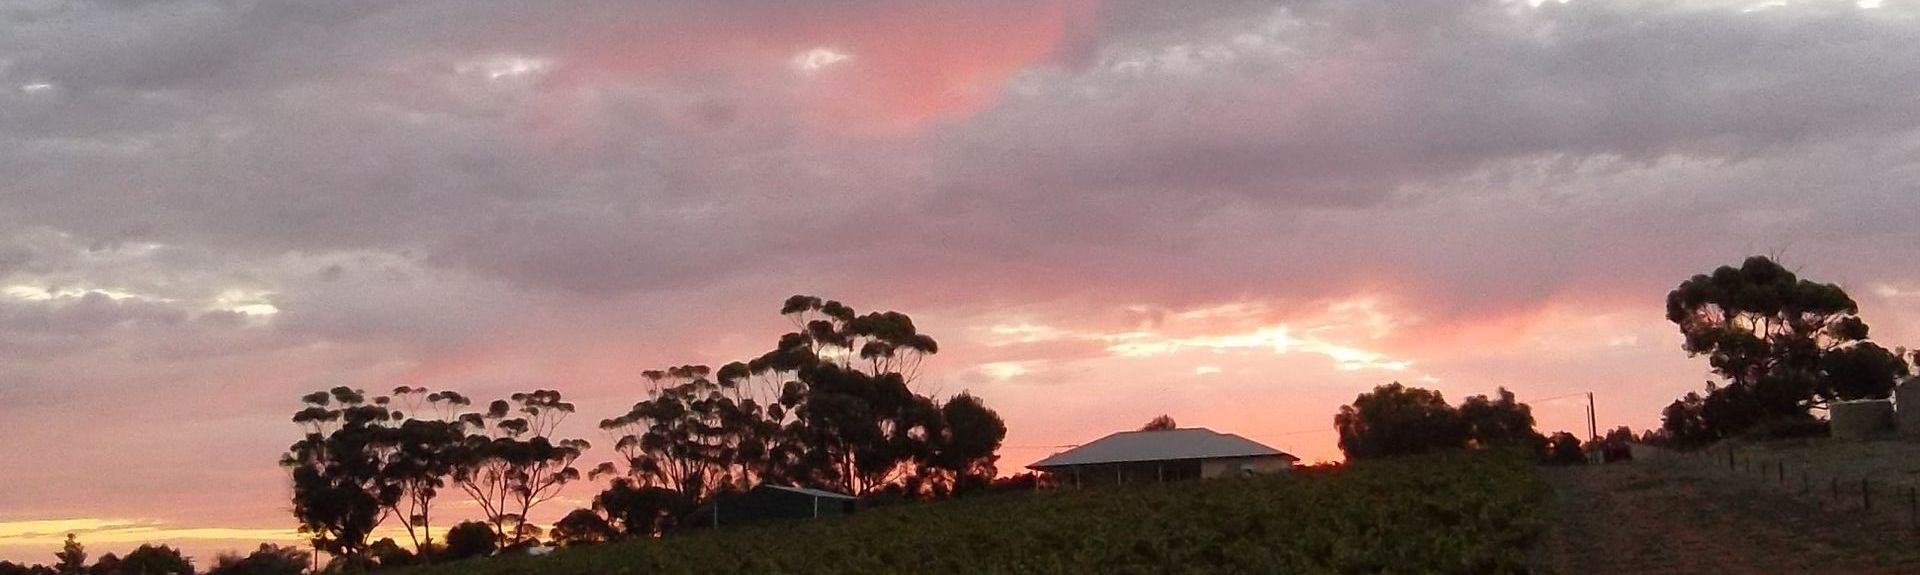 Saddleworth, South Australia, AU